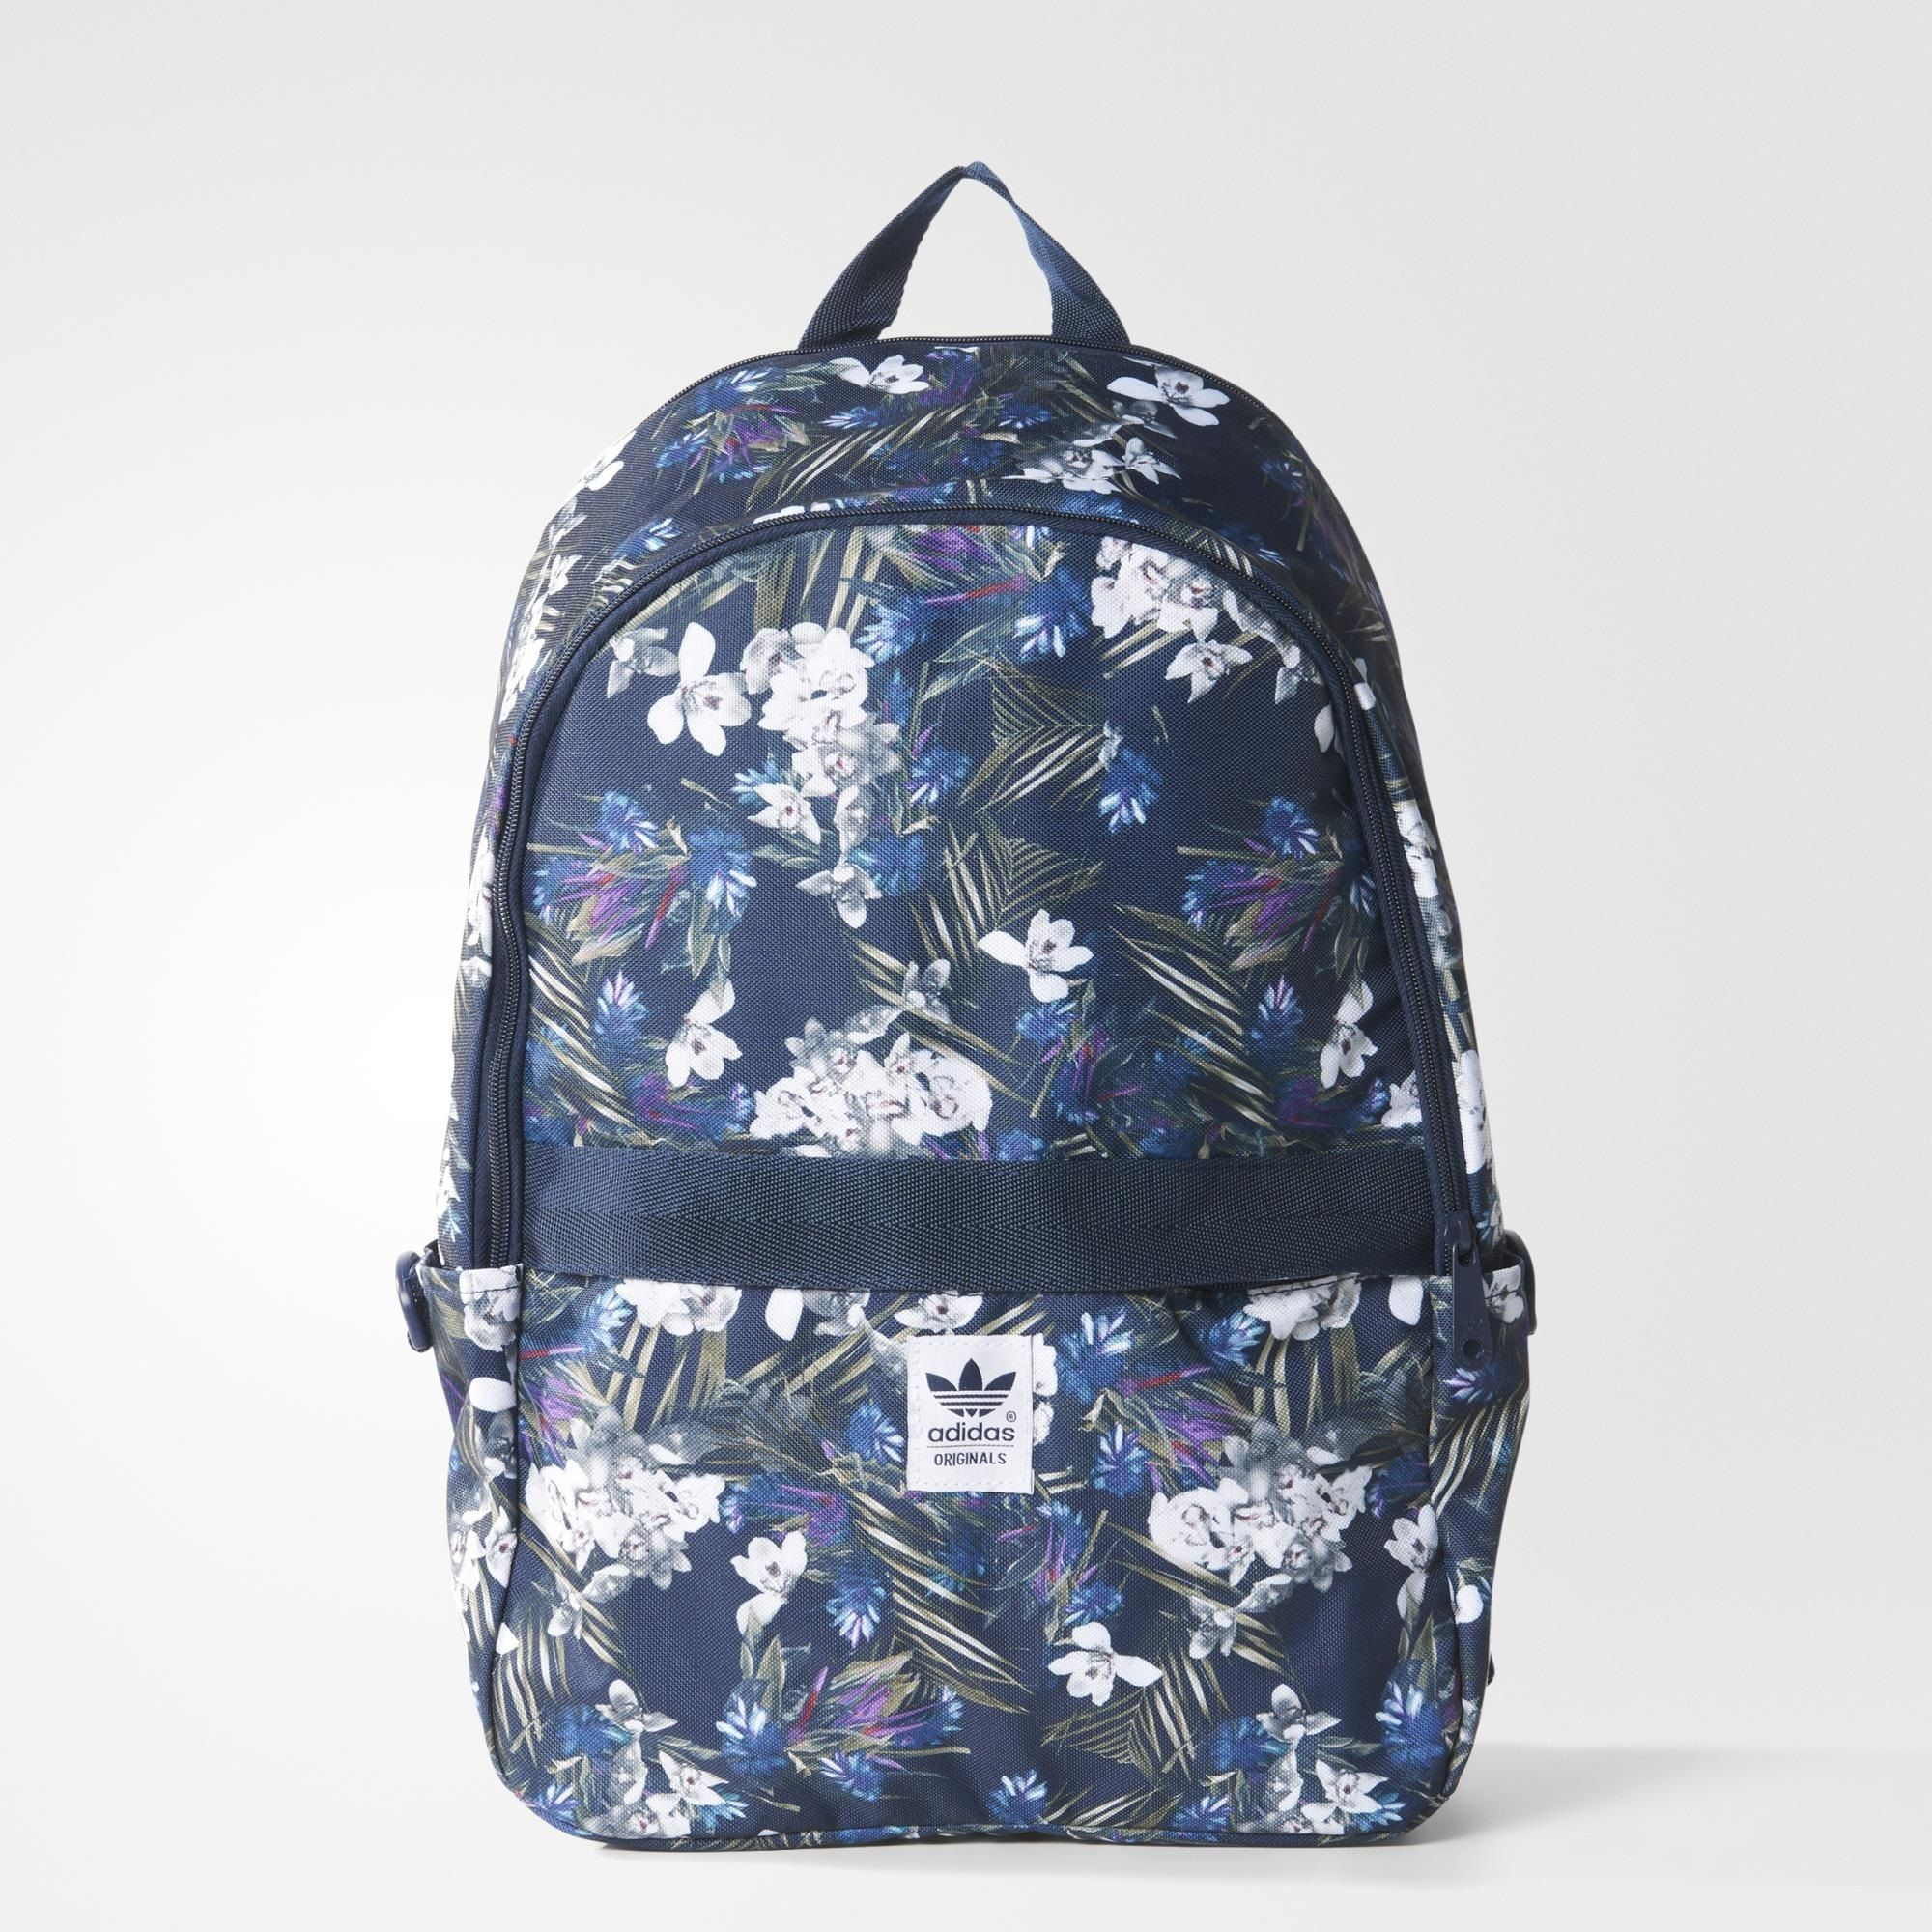 879011394ed8 Buy adidas rucksack backpack   OFF50% Discounted